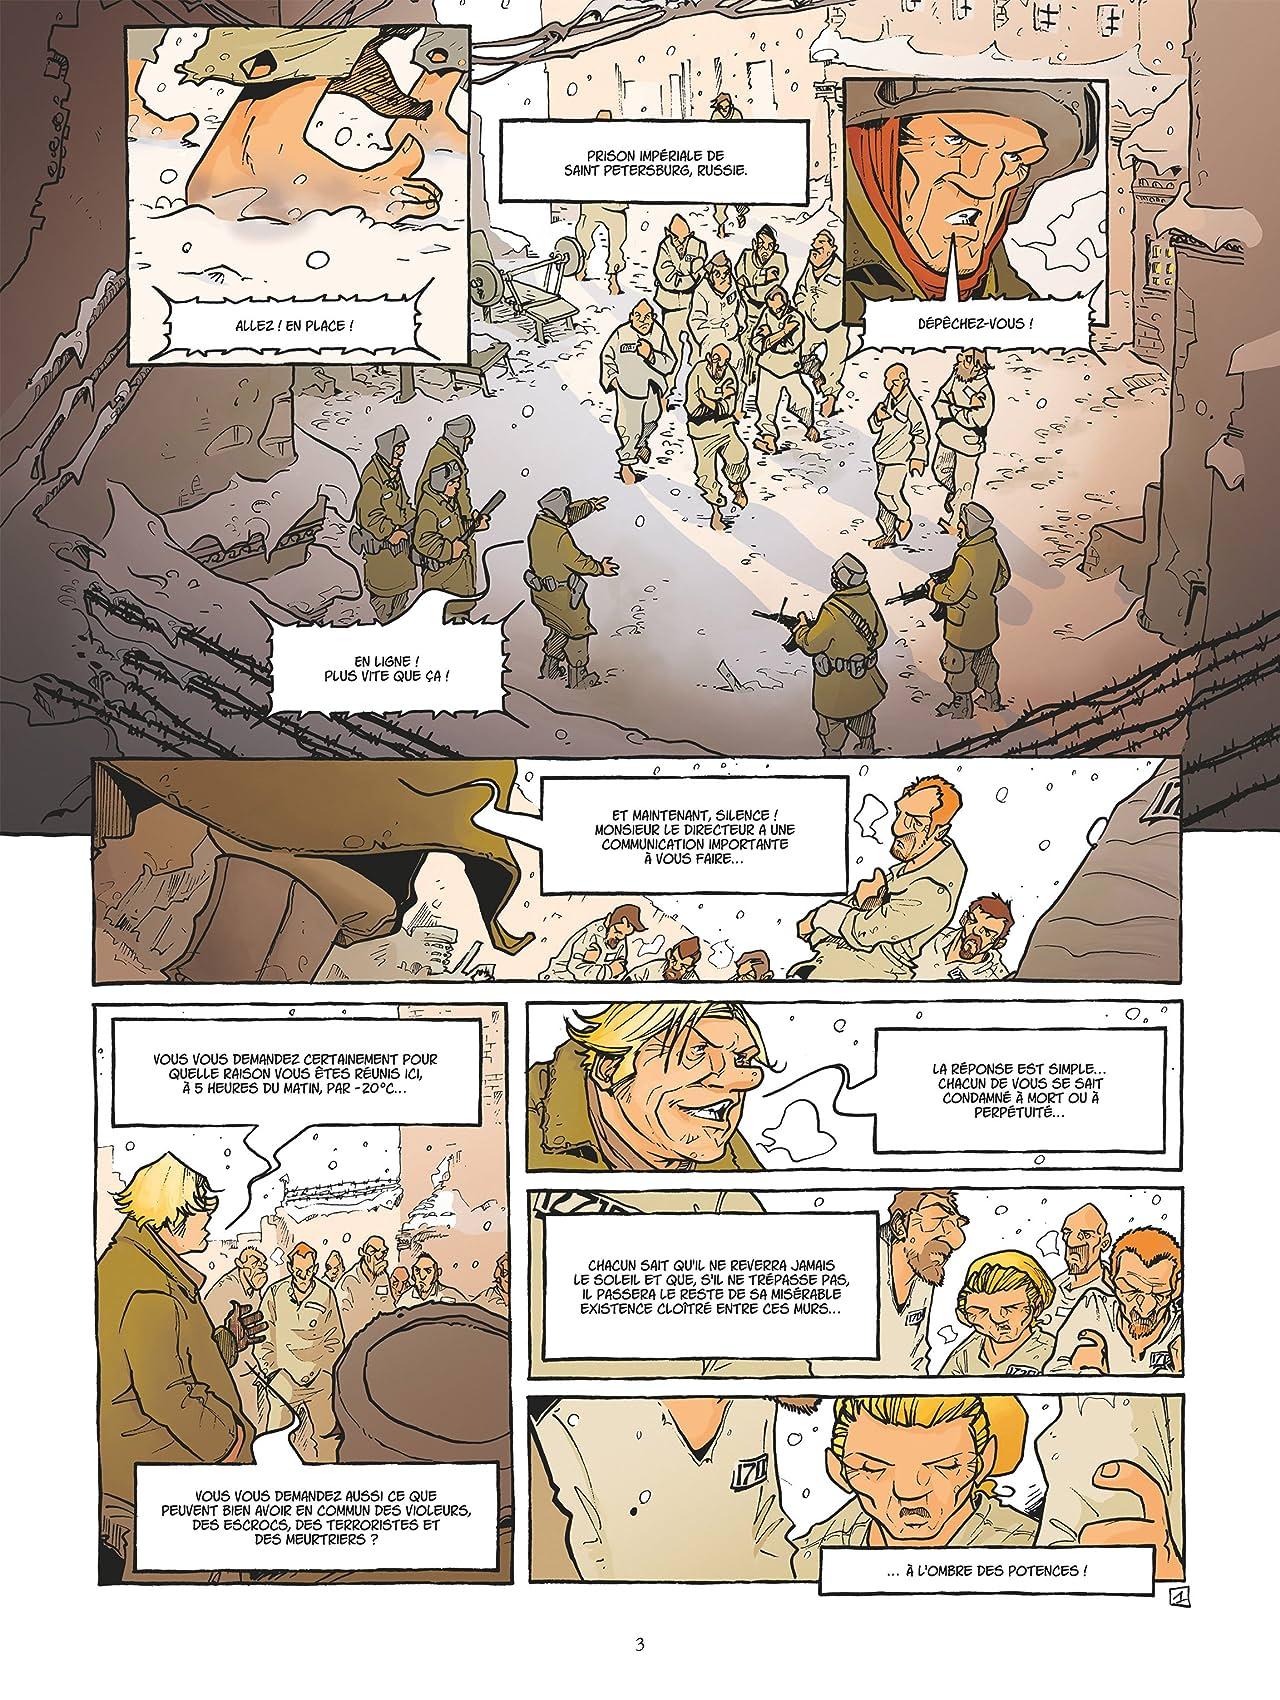 Uchronie(s) - New Moscow Vol. 3